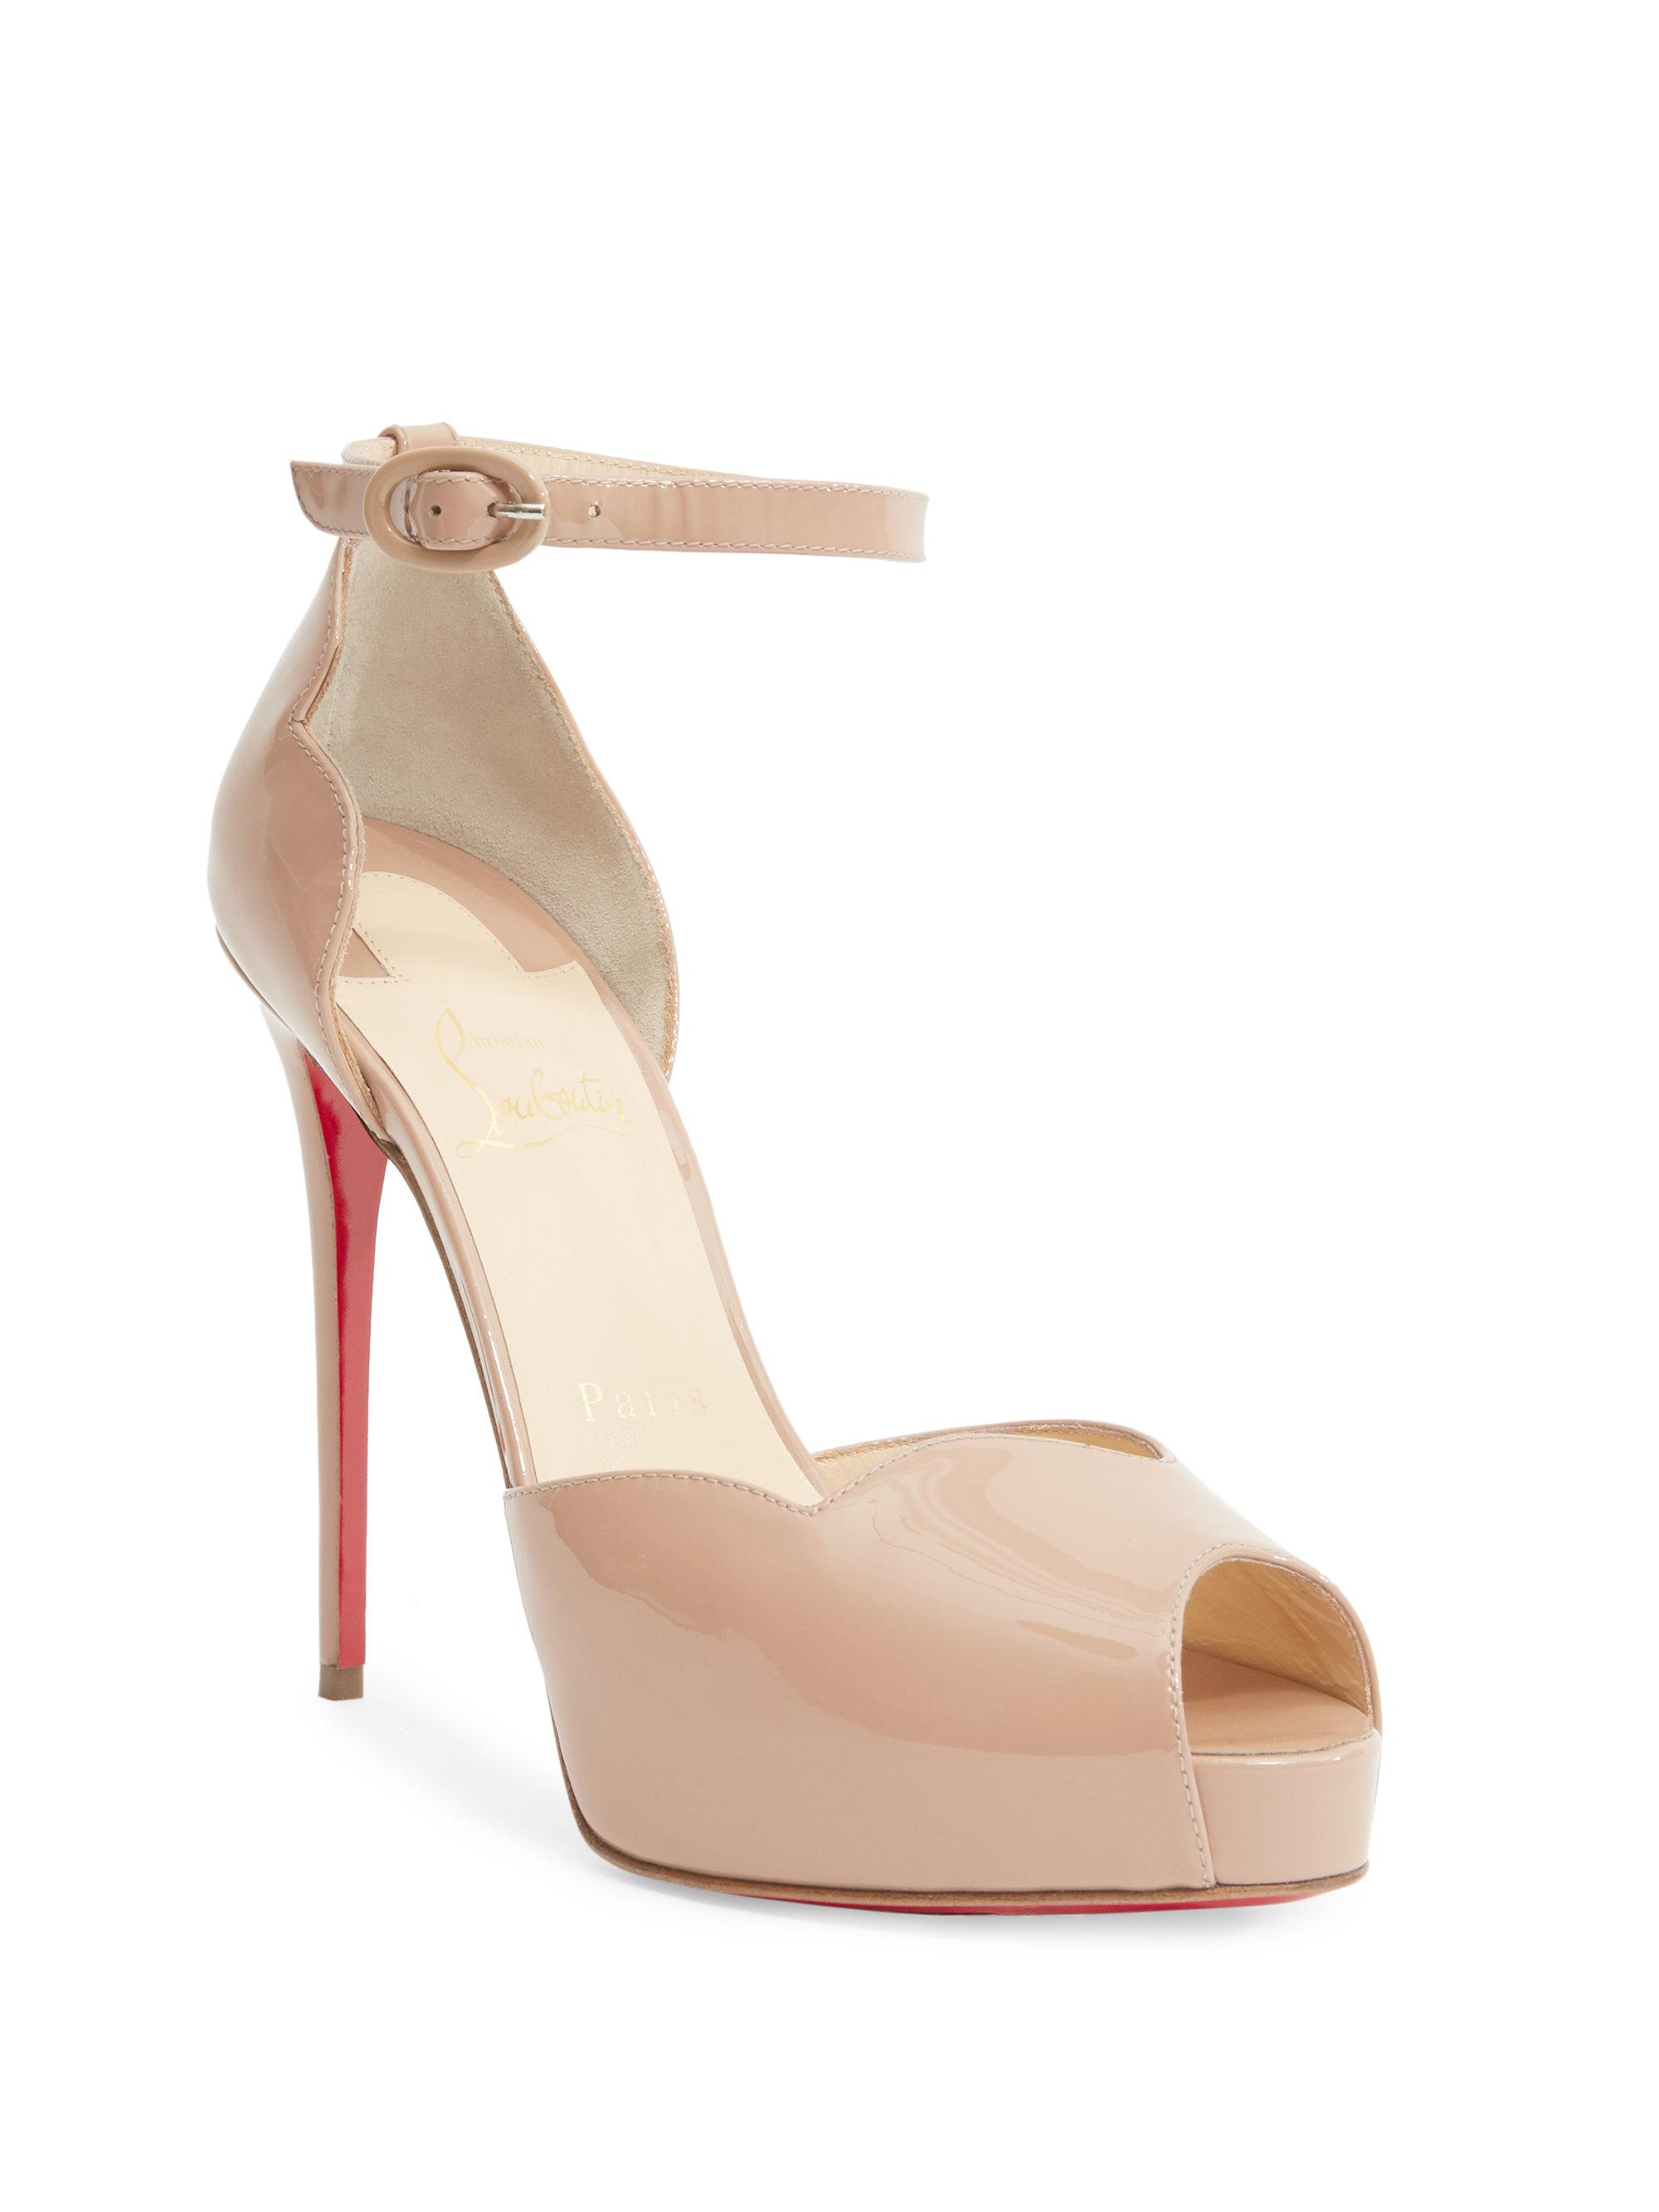 05969576f4d9 Christian Louboutin Aketata 120 Patent Leather Peep Toe Sandals in ...